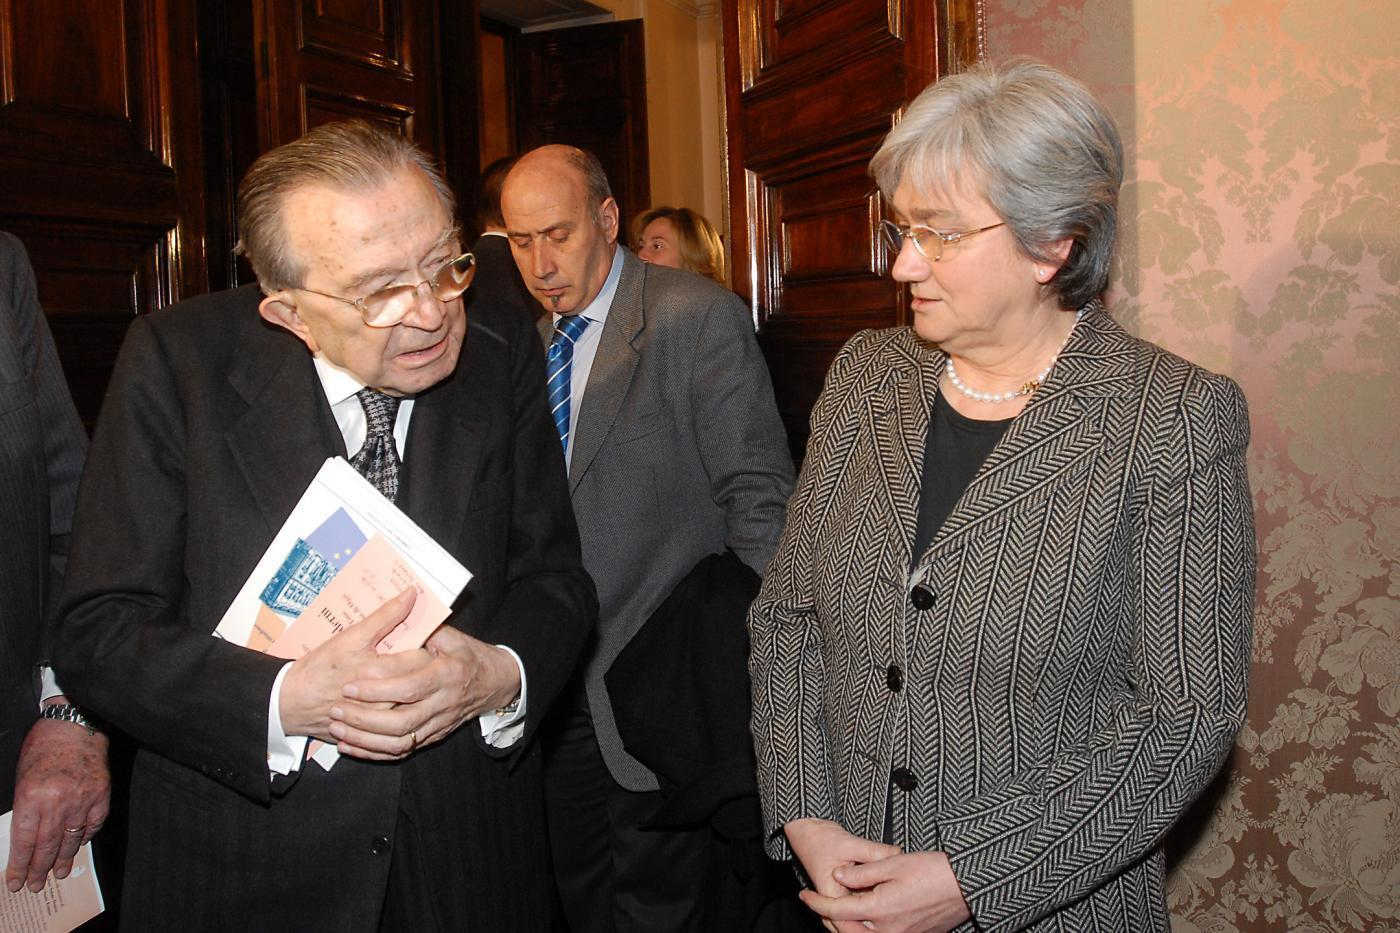 Con Rosy Bindi - 2007